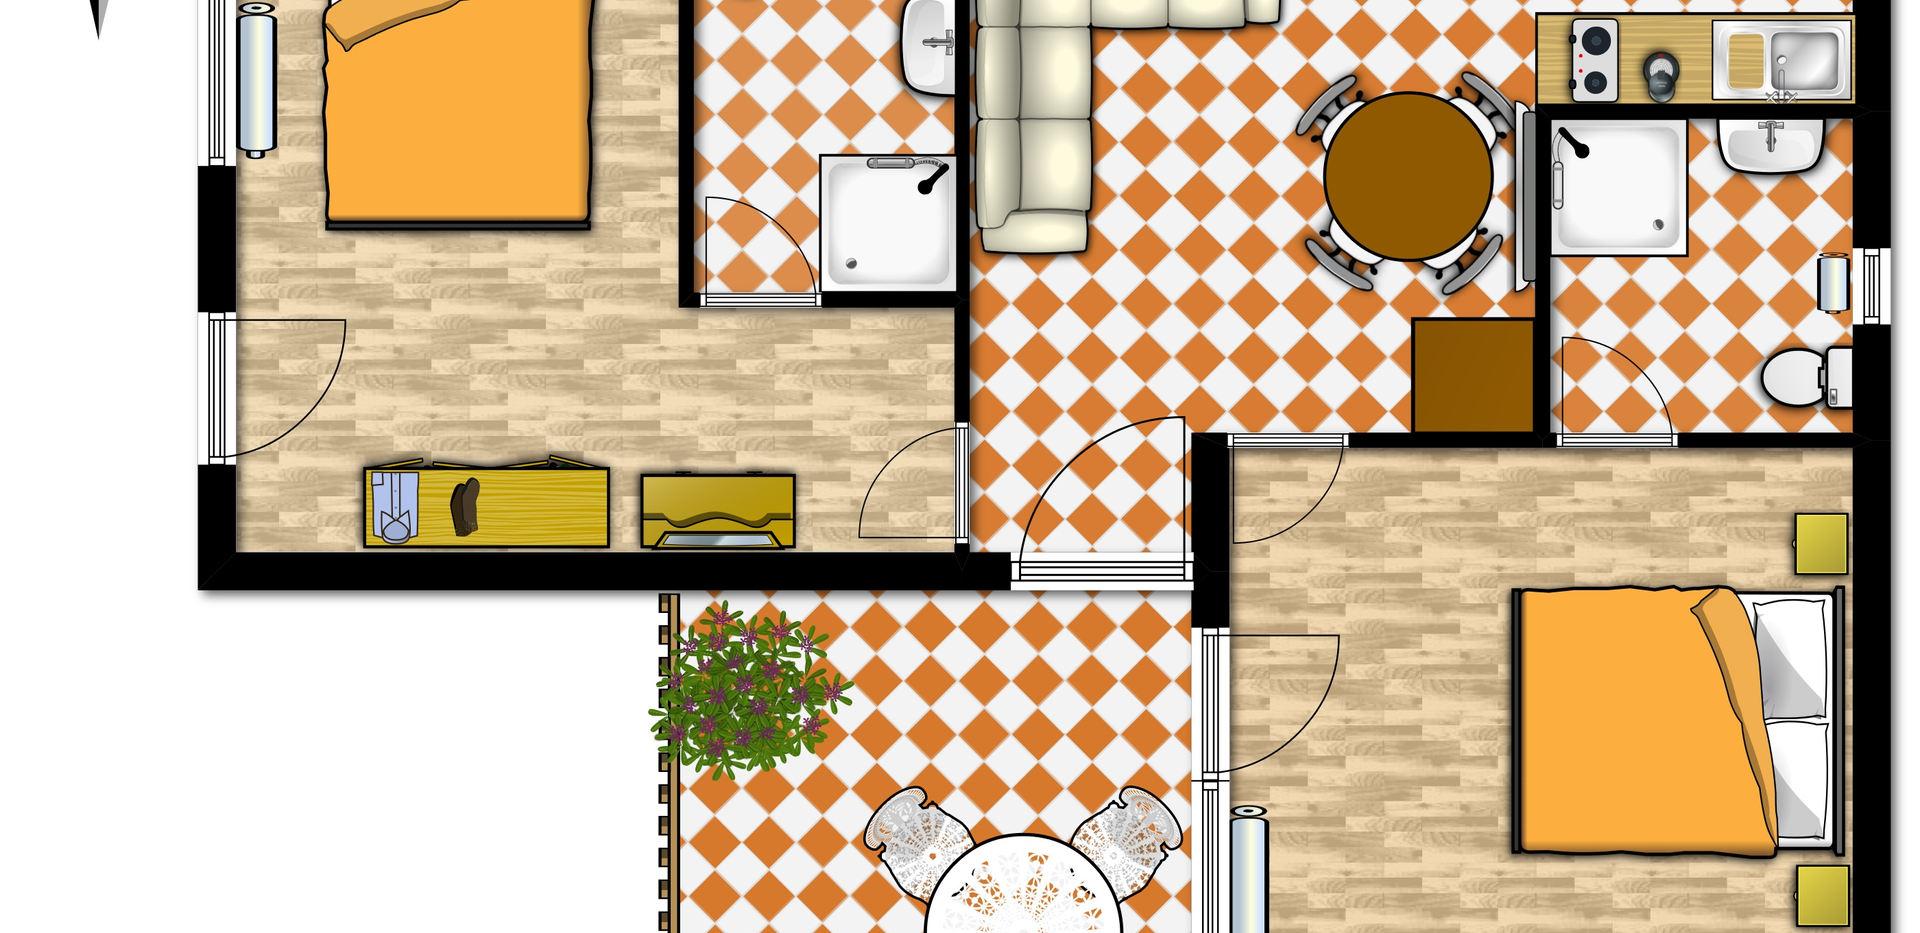 Zalakaros_House2_App4